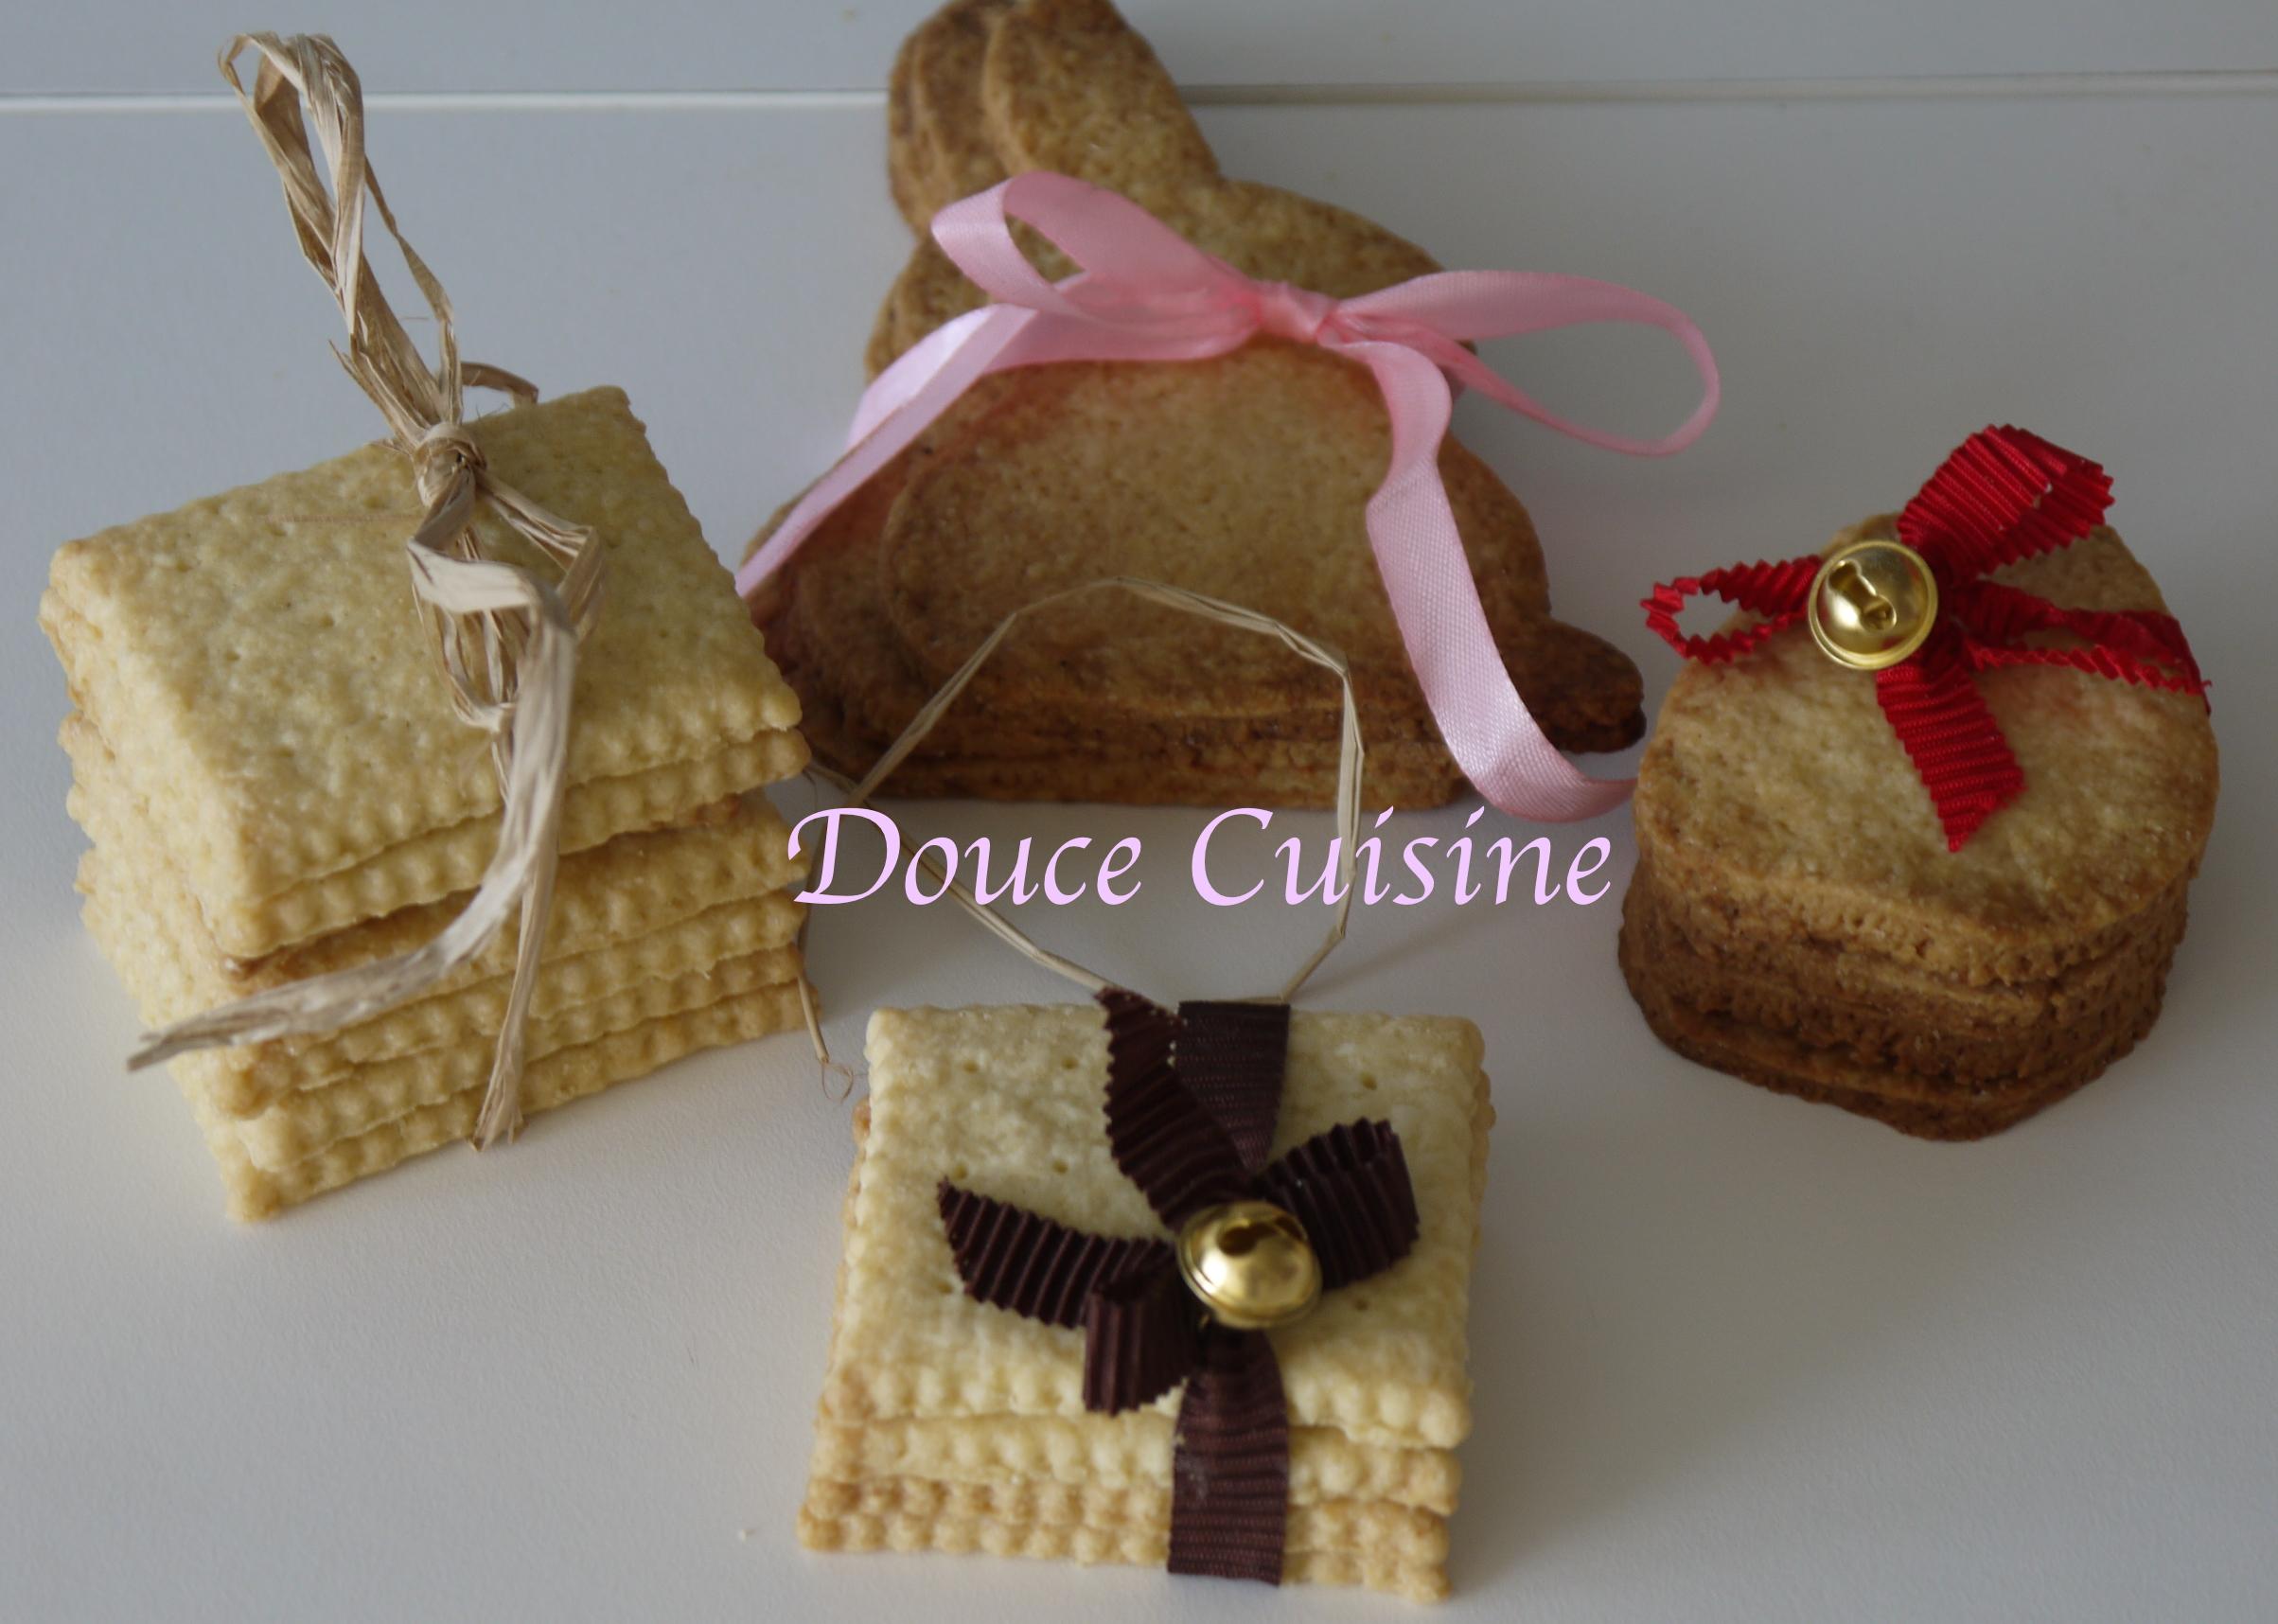 biscuits pour b b douce cuisine. Black Bedroom Furniture Sets. Home Design Ideas